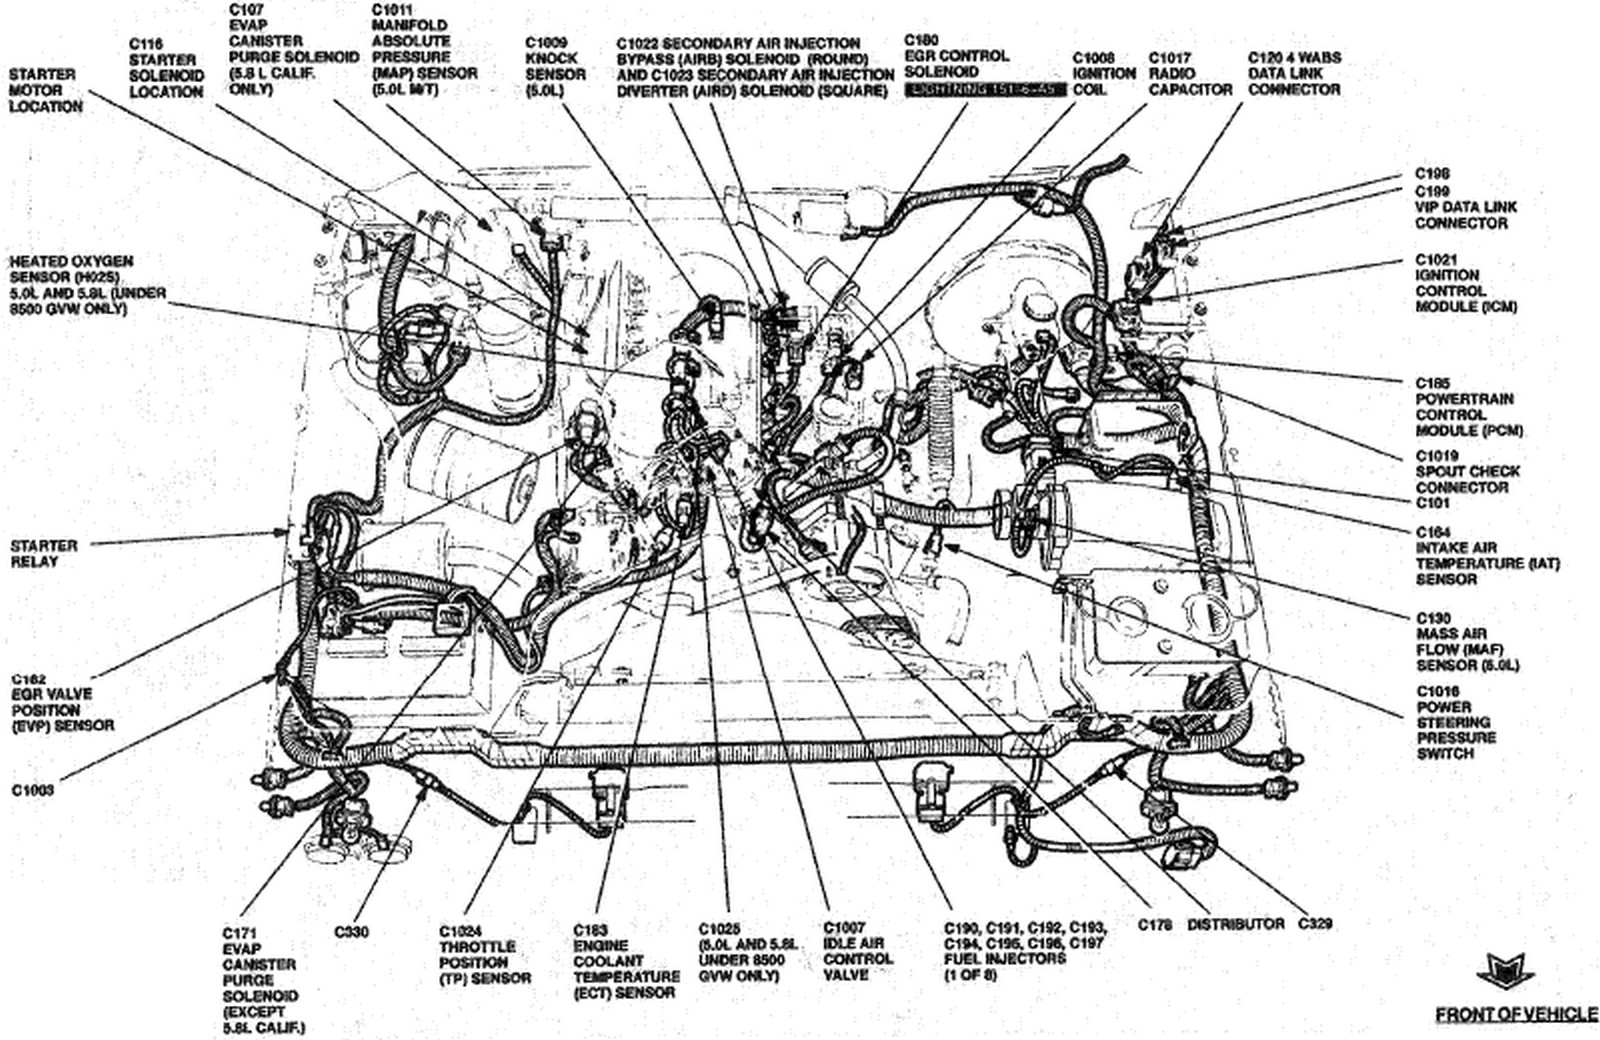 1995 F250  Powerstroke  Cam Sensor  Jump Start  Same Time To Crank It